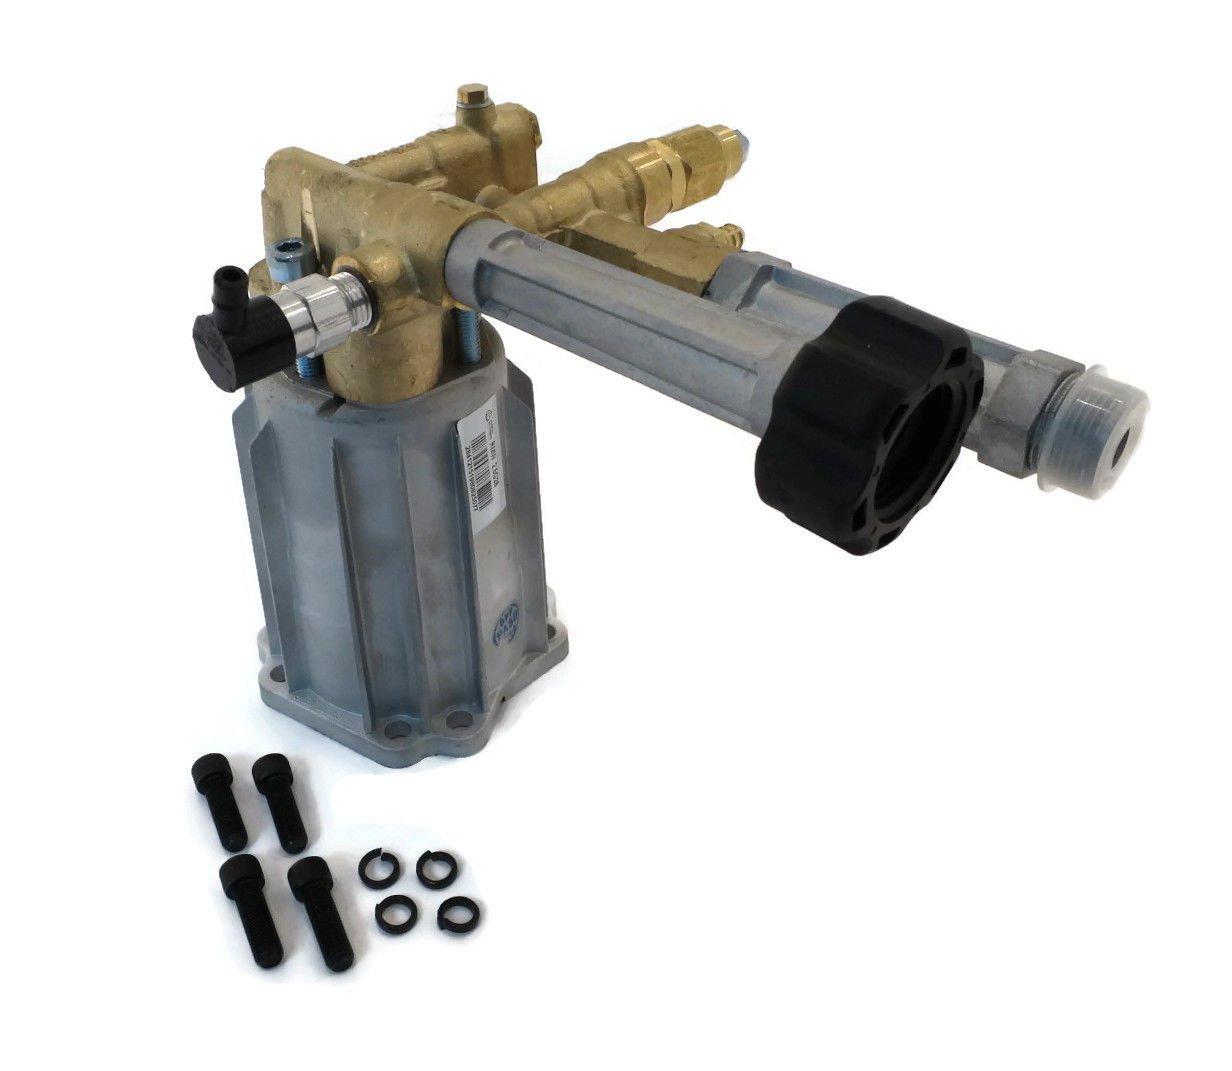 Annovi Reververi OEM Max 84% OFF Power Pressure Washer Pump Ranking TOP18 PSI 2800 Water -